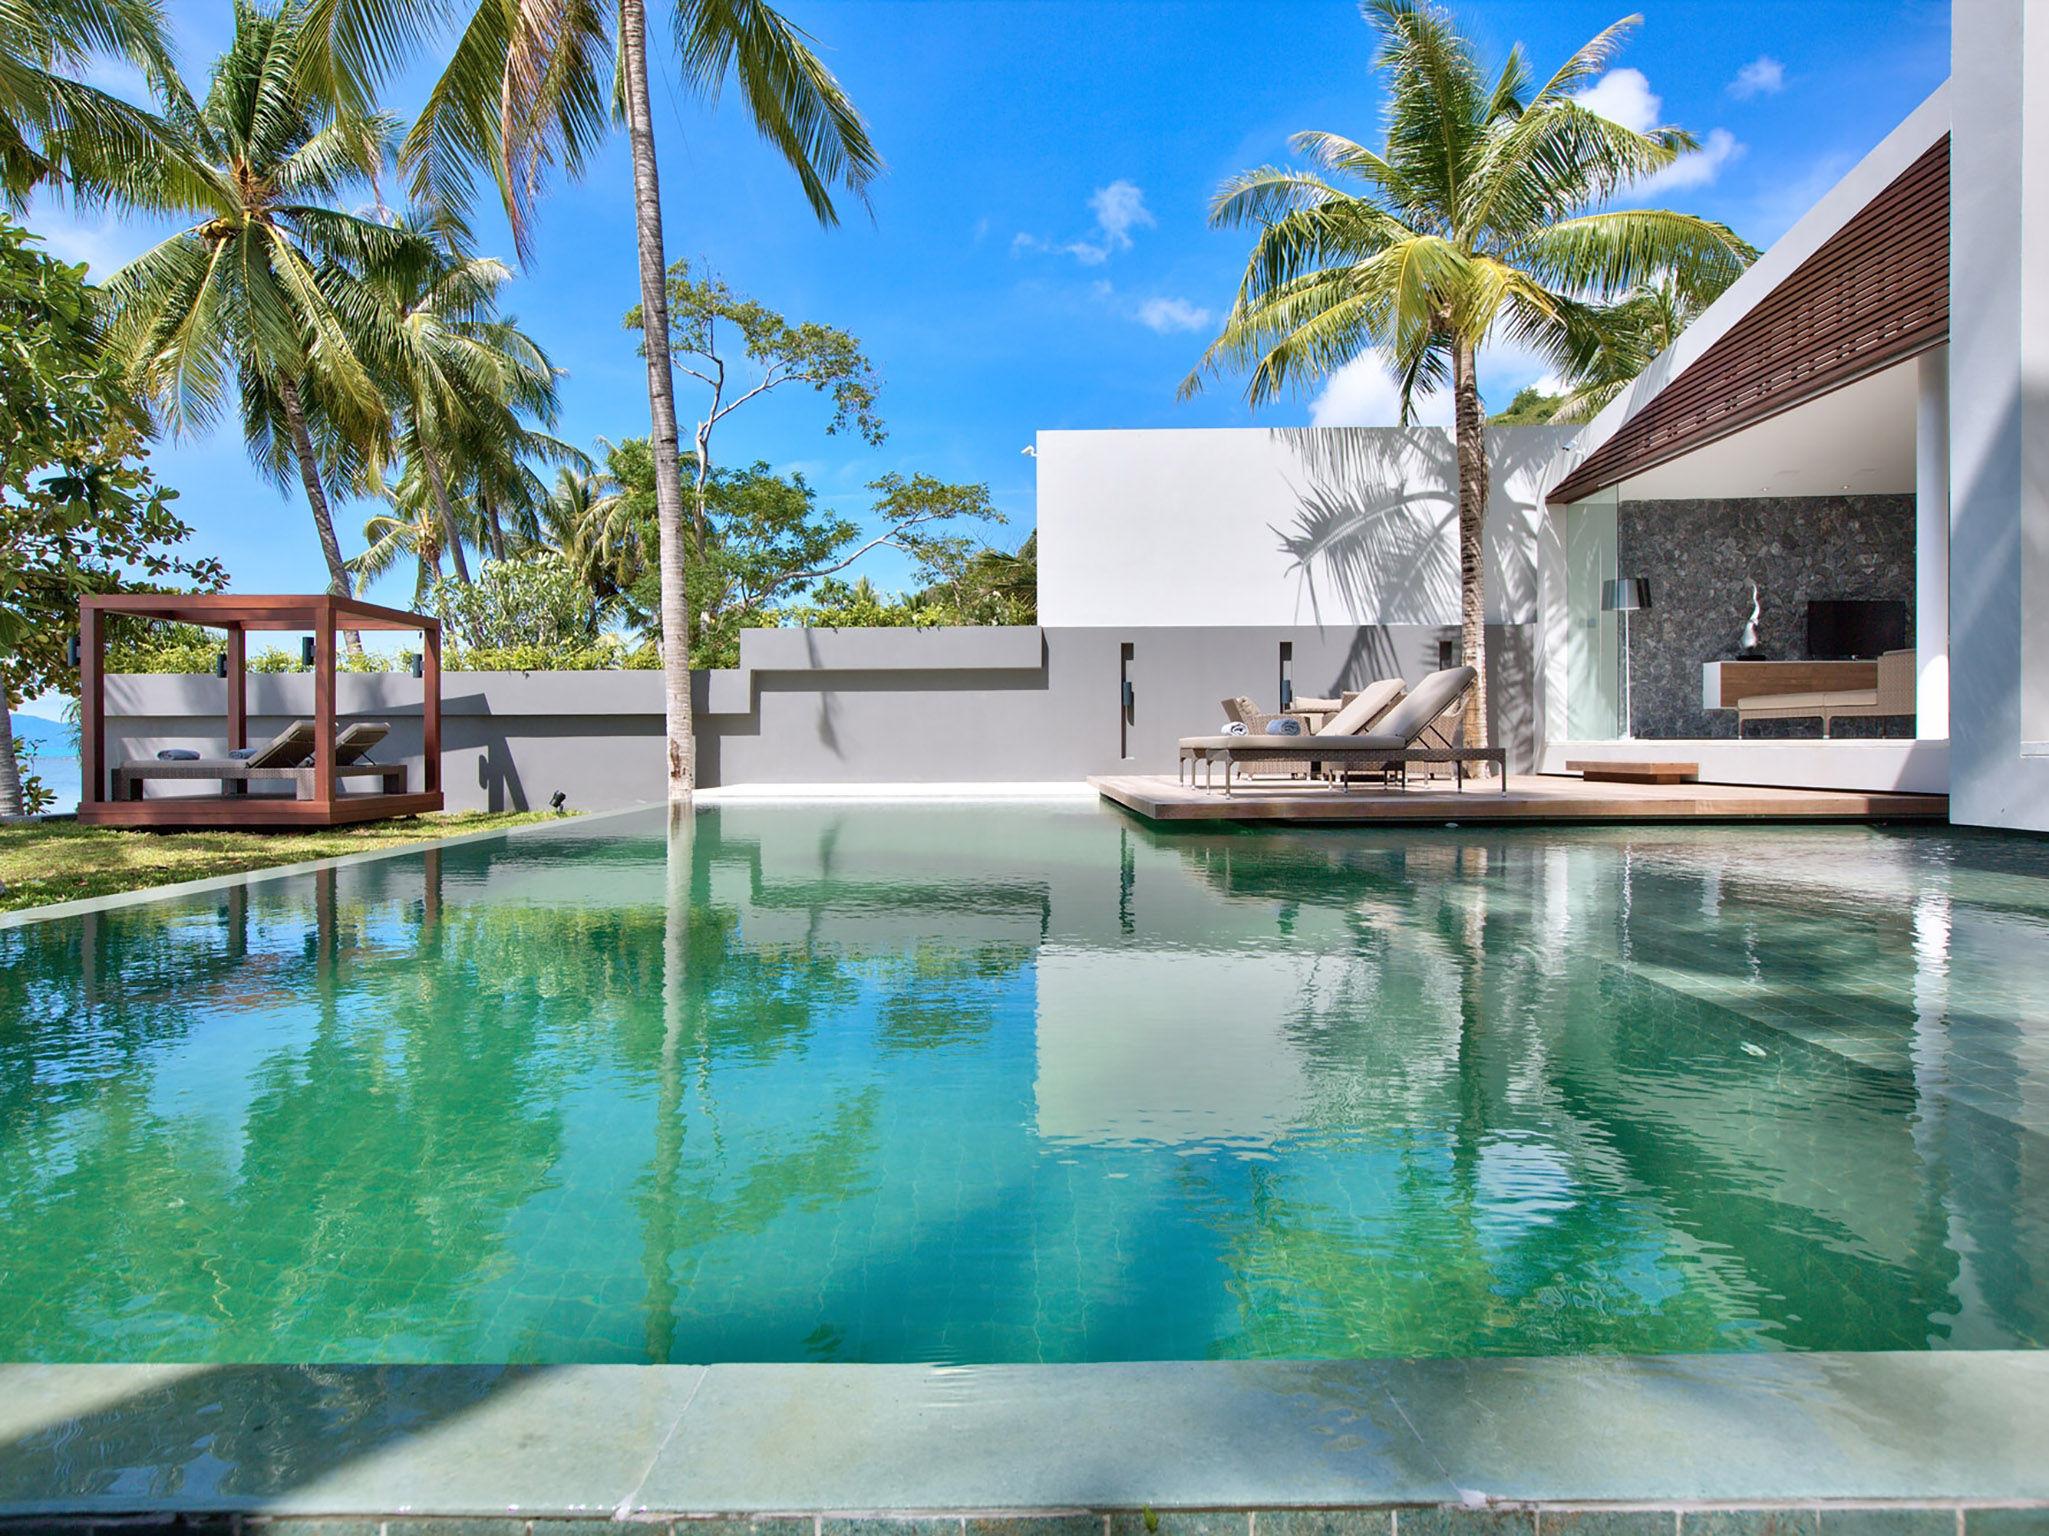 Villa Soong at Mandalay Beach Villas - Swim under a clear blue sky